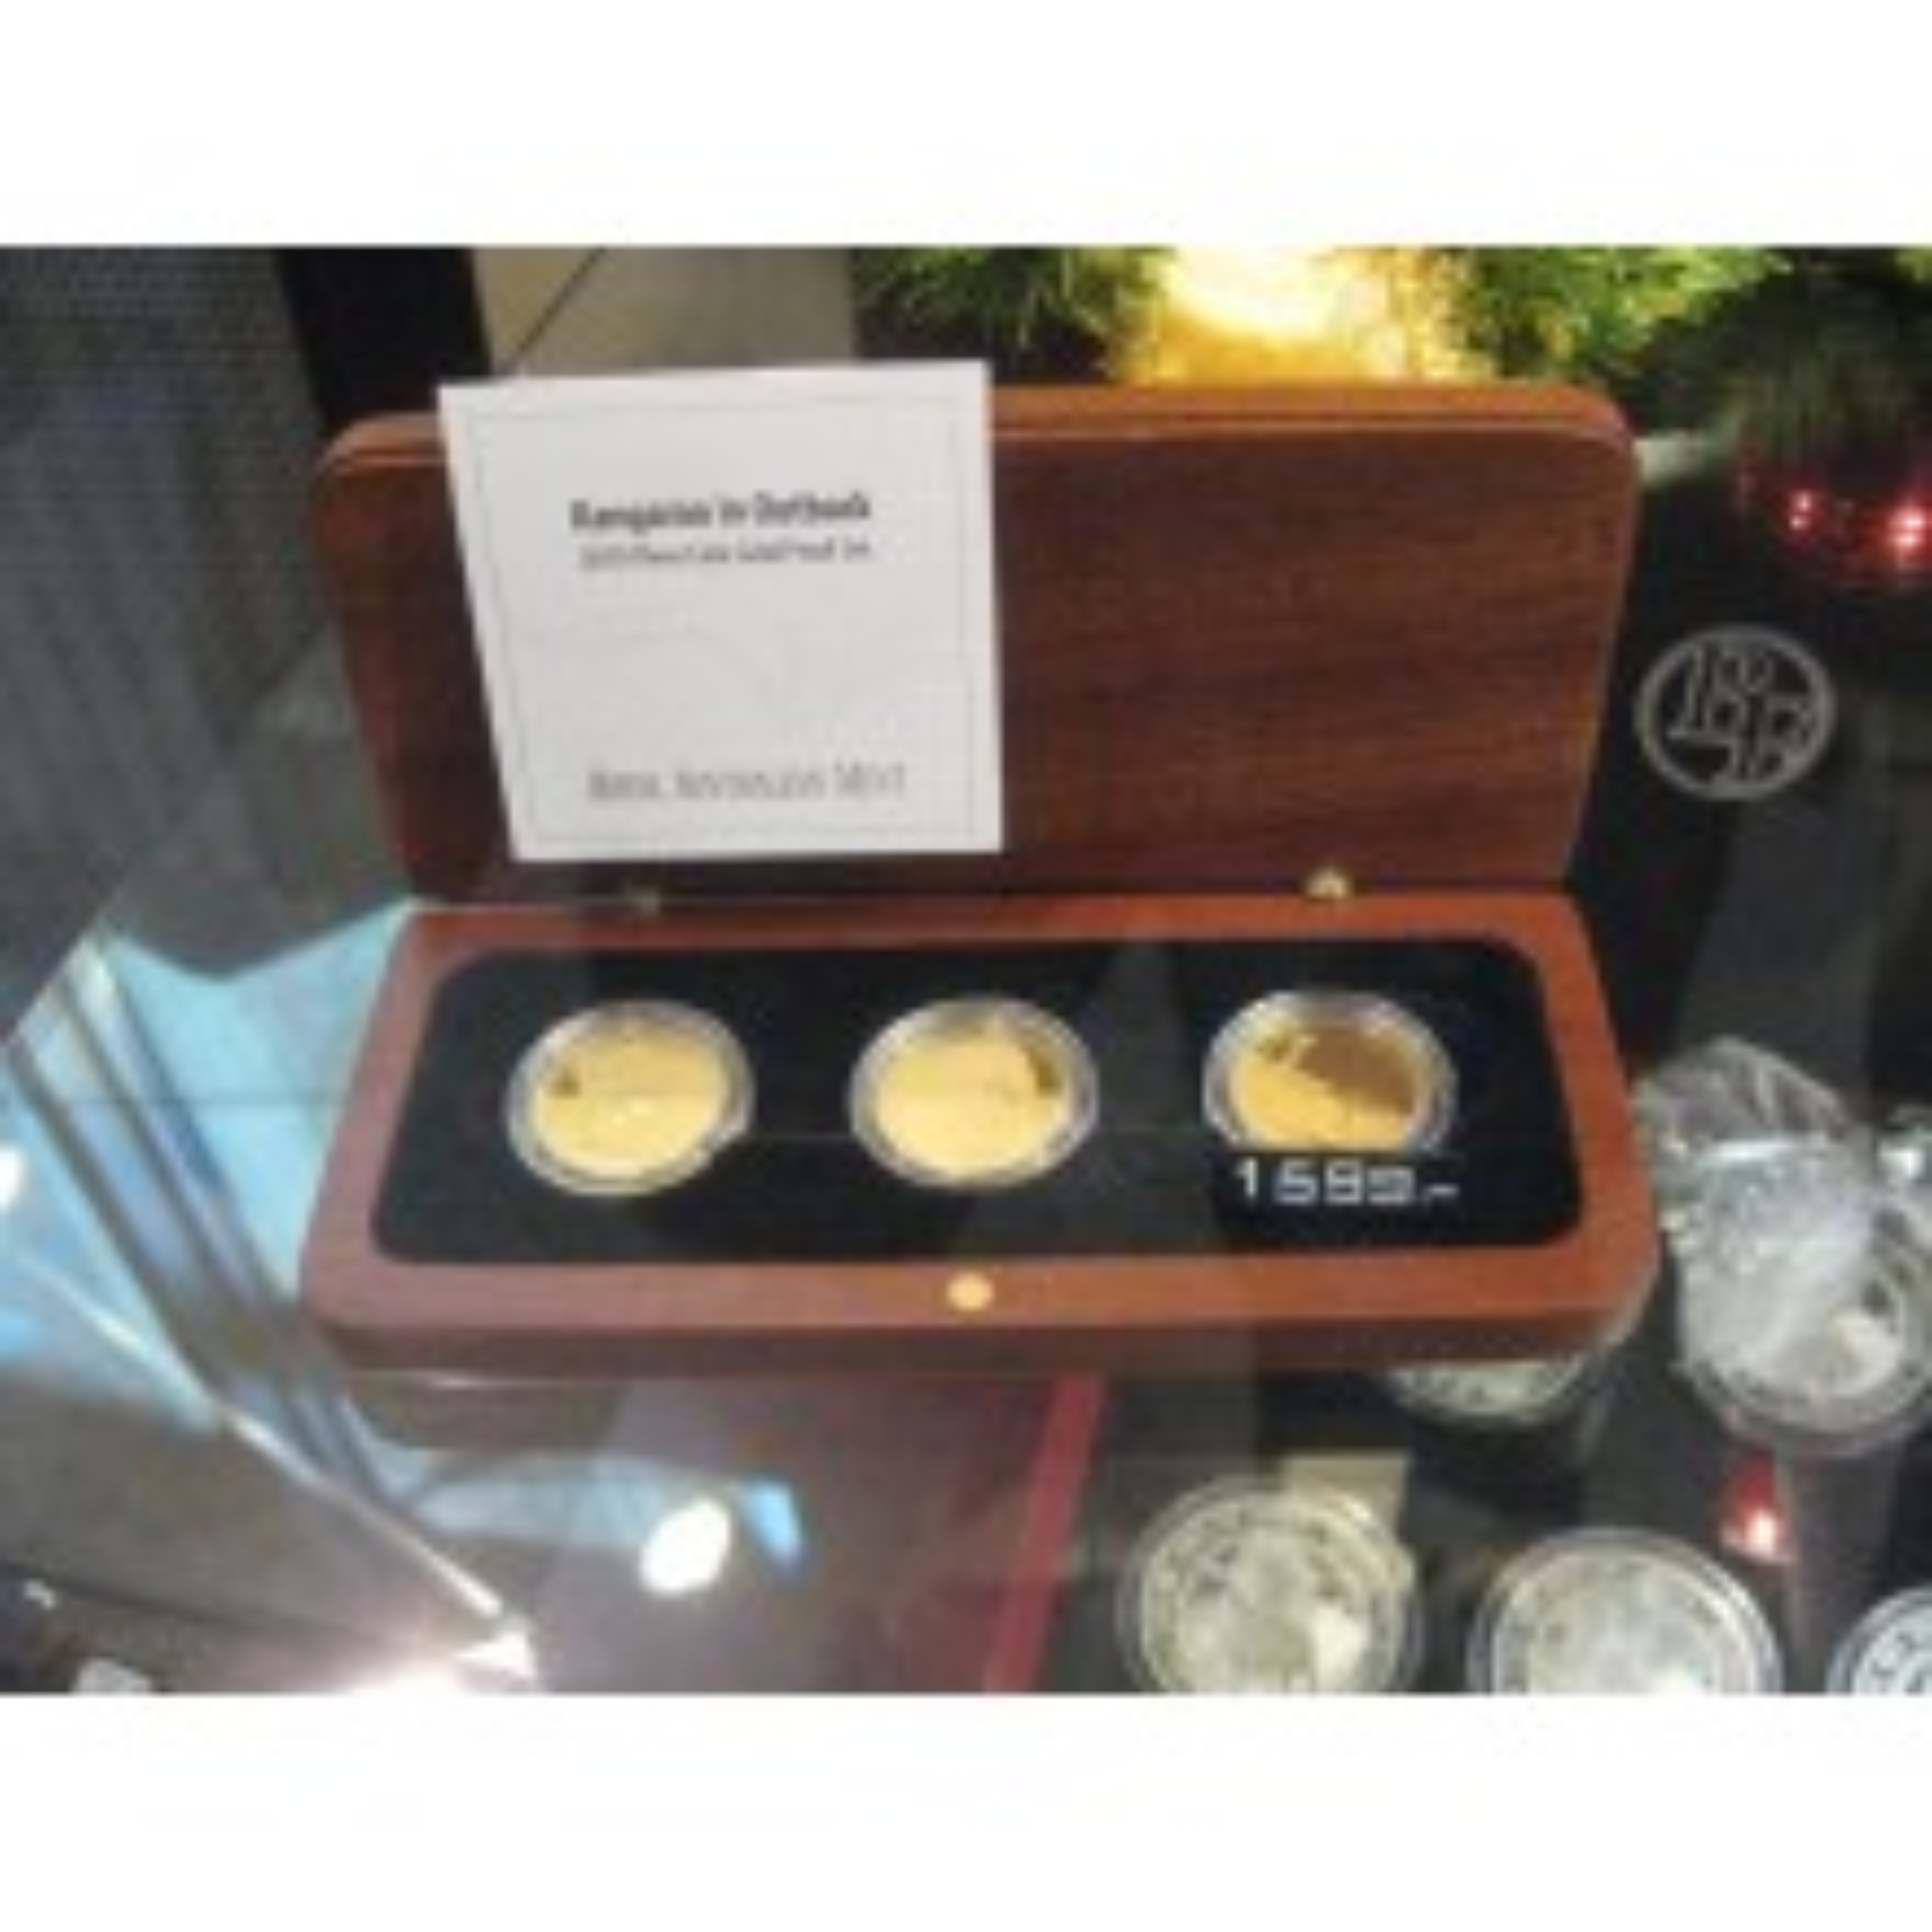 Set 1/5 troy ounce Kangaroo munten 2011 in proof kwaliteit